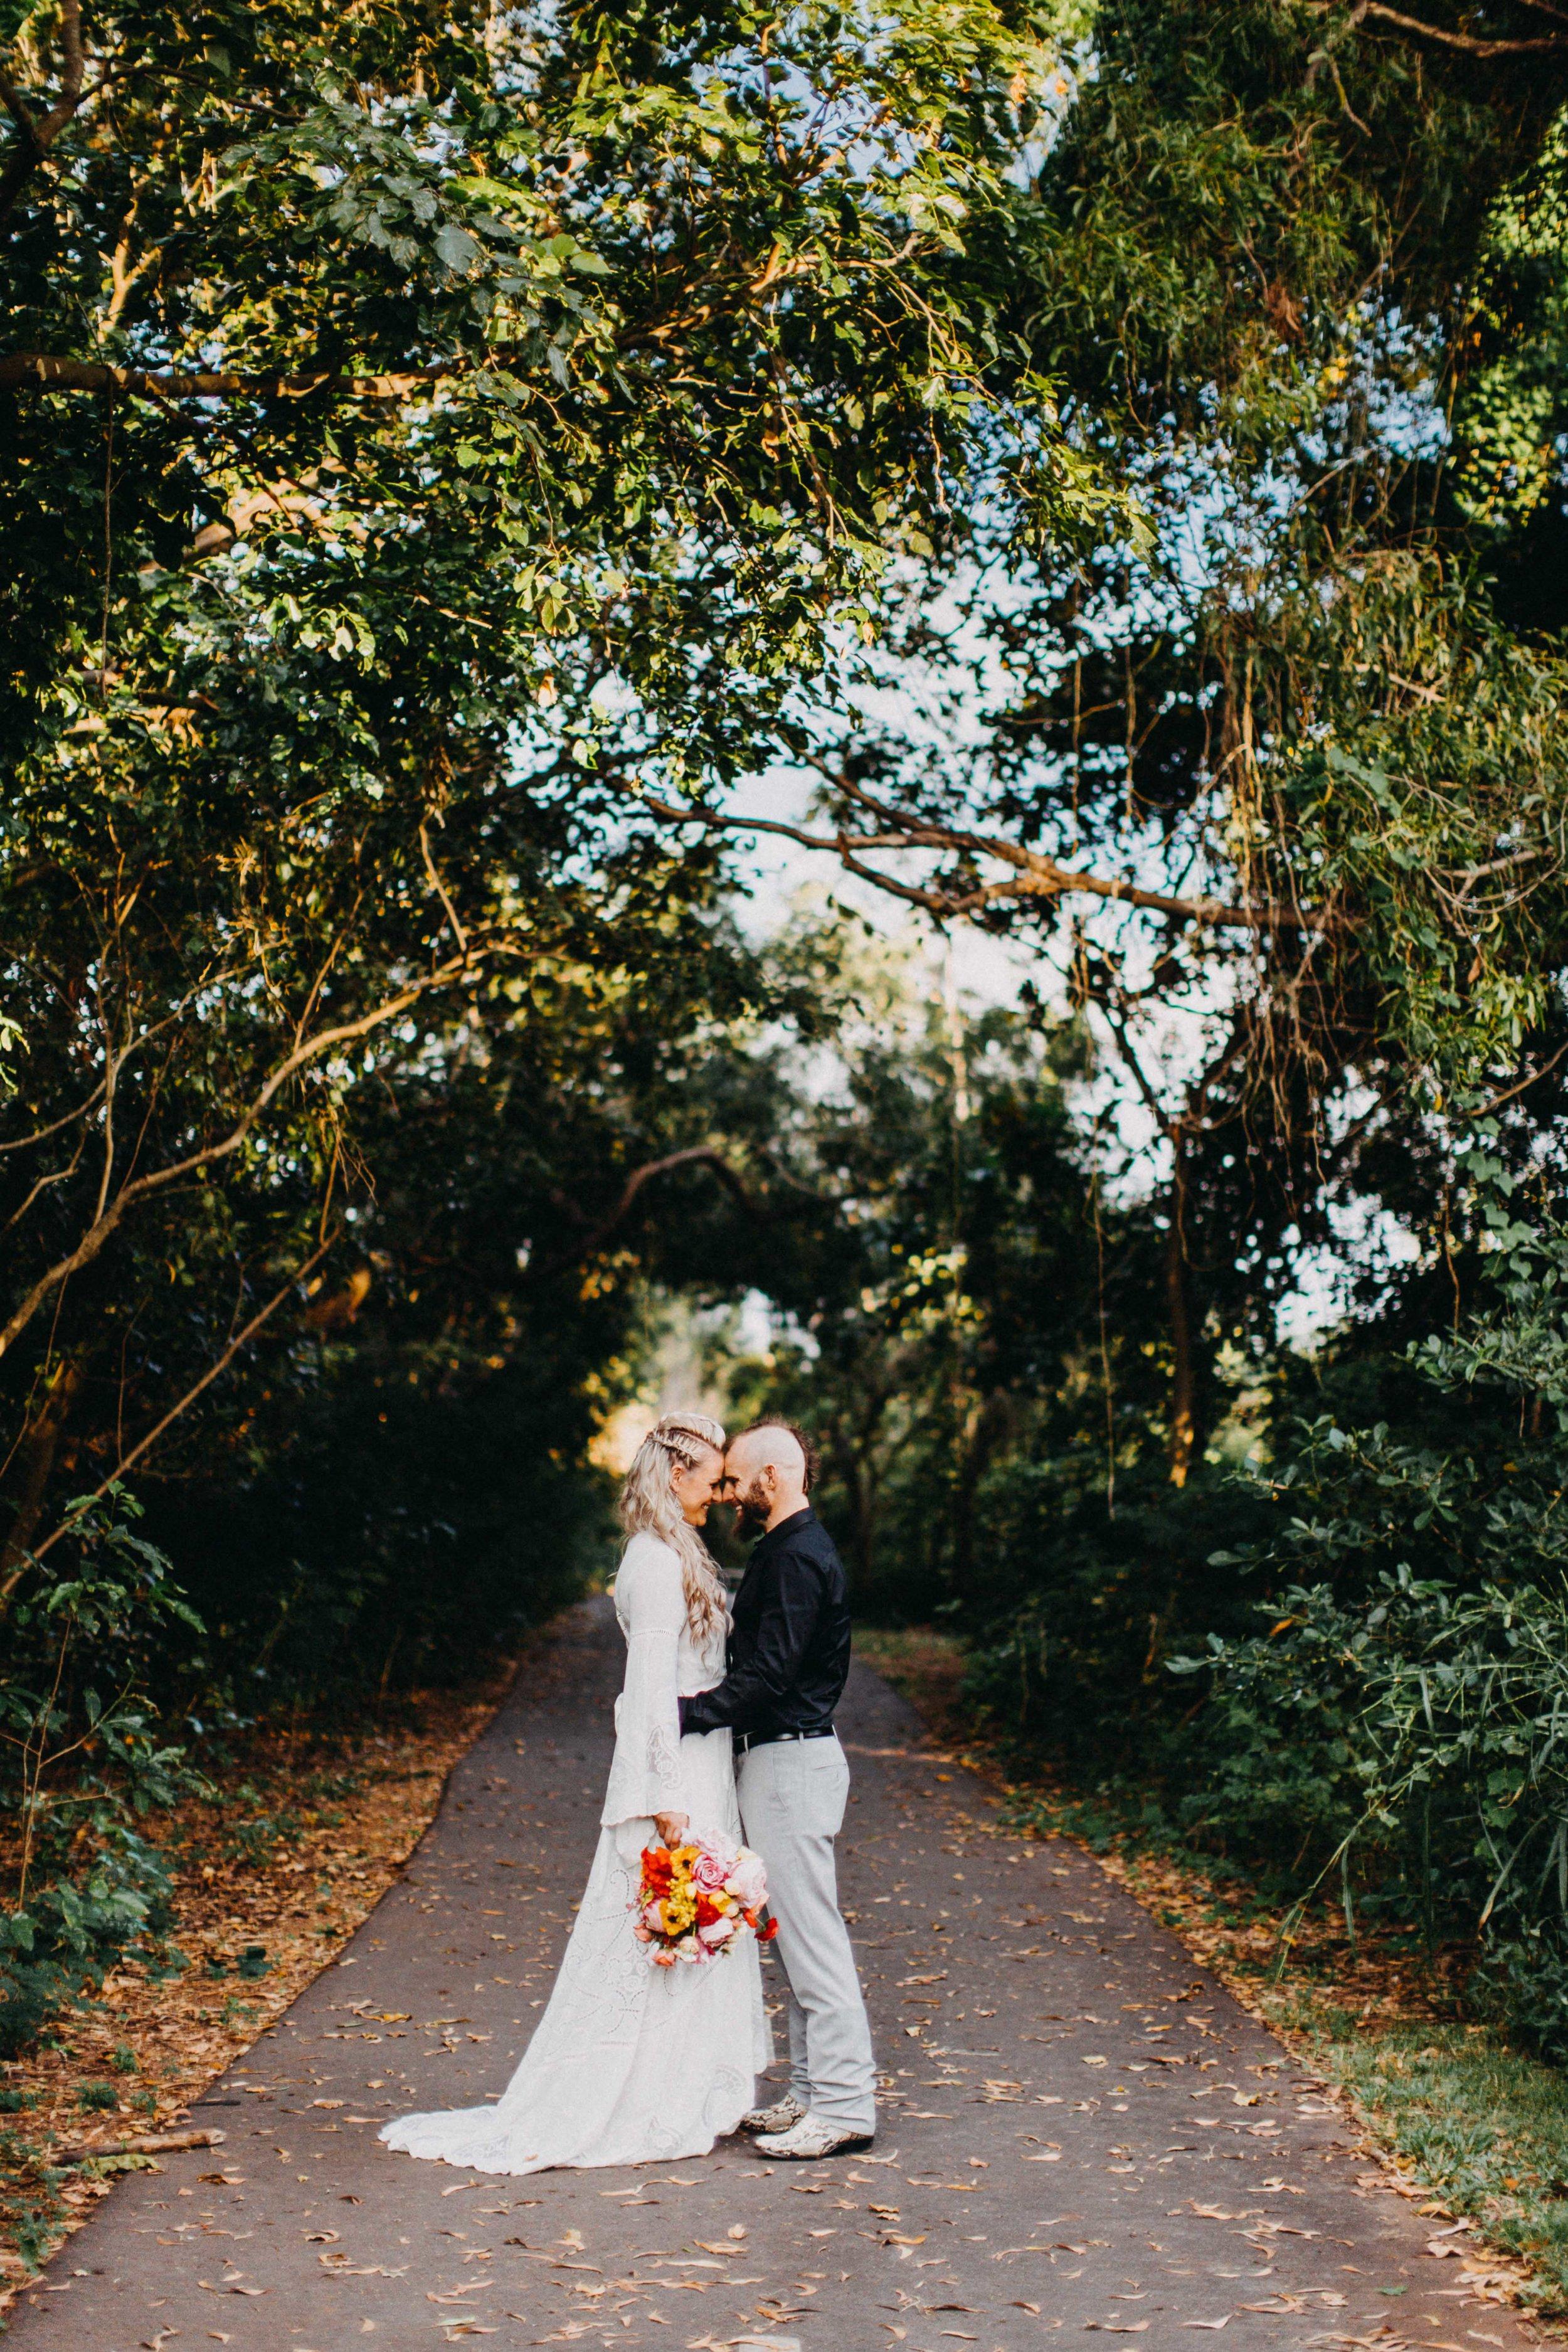 darwin-elopement-wedding-beach-camden-photography-www.emilyobrienphotography.net-54.jpg